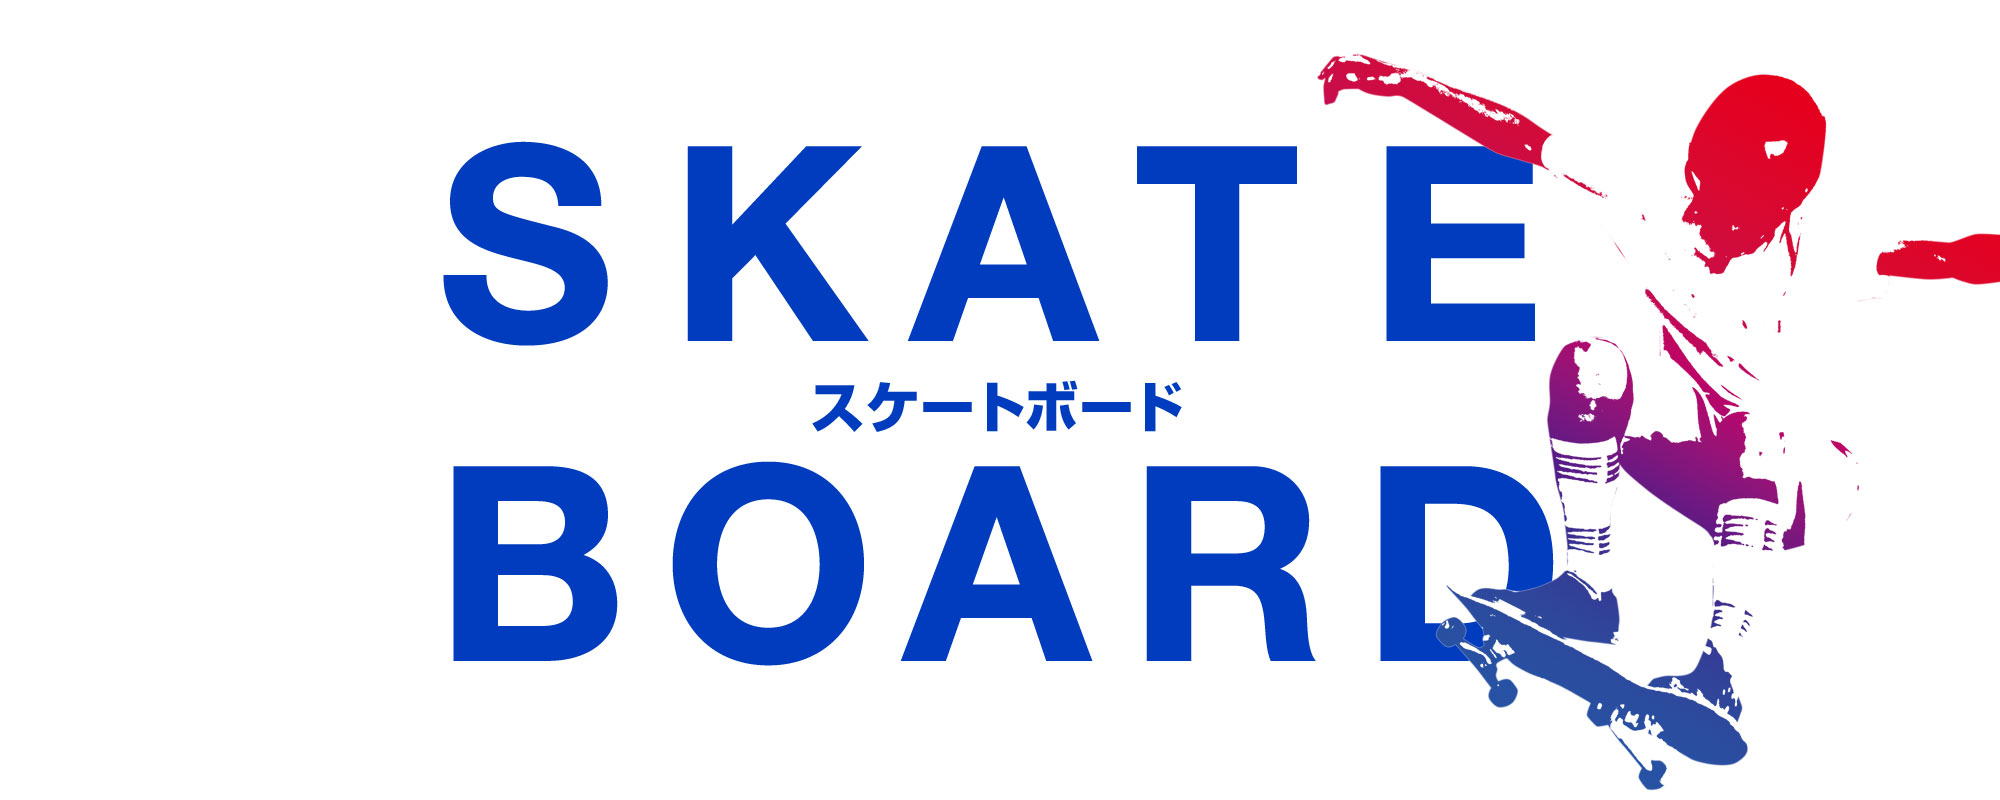 SKATE BOARD スケートボード